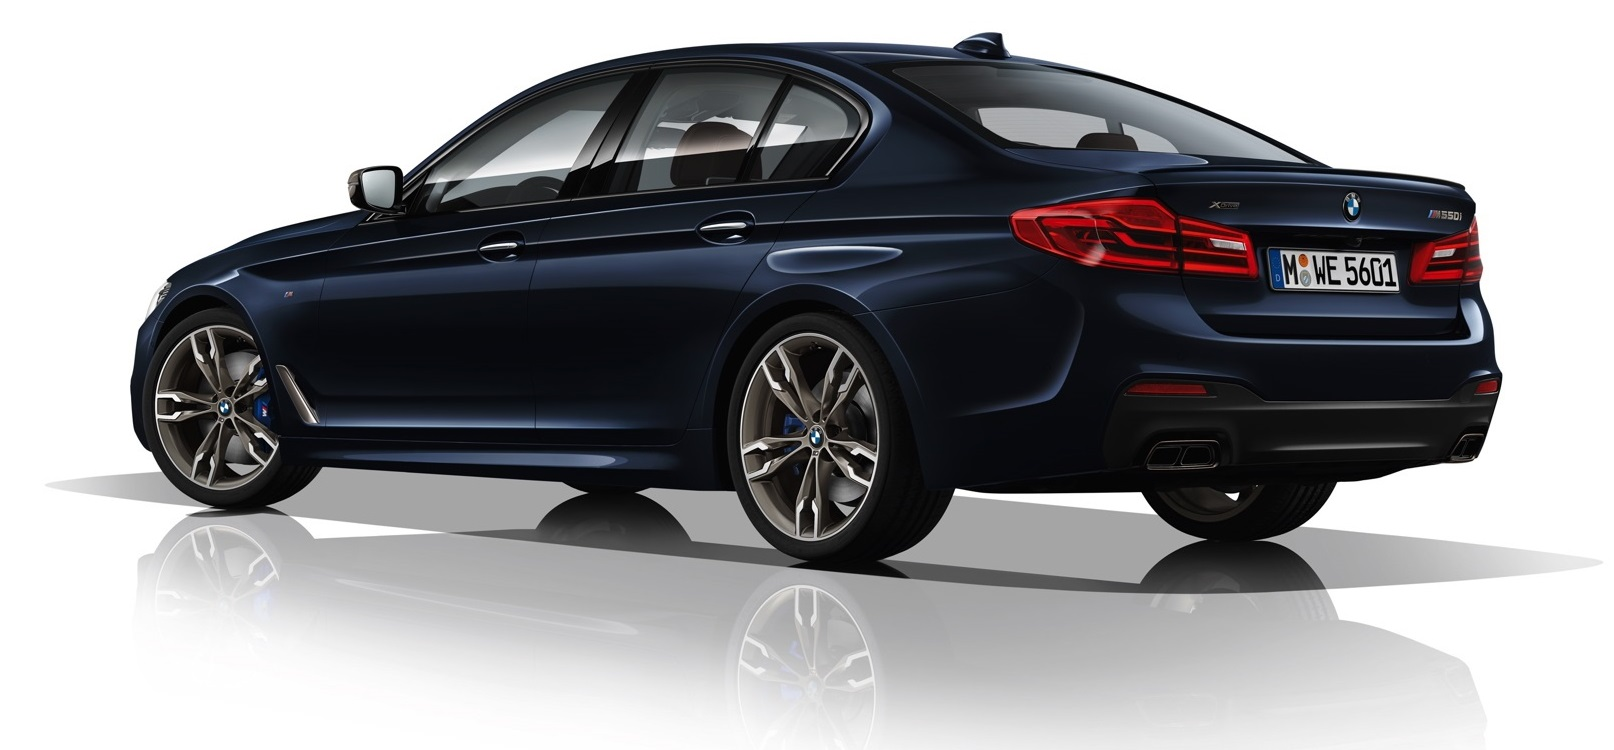 BMW G30 M550i